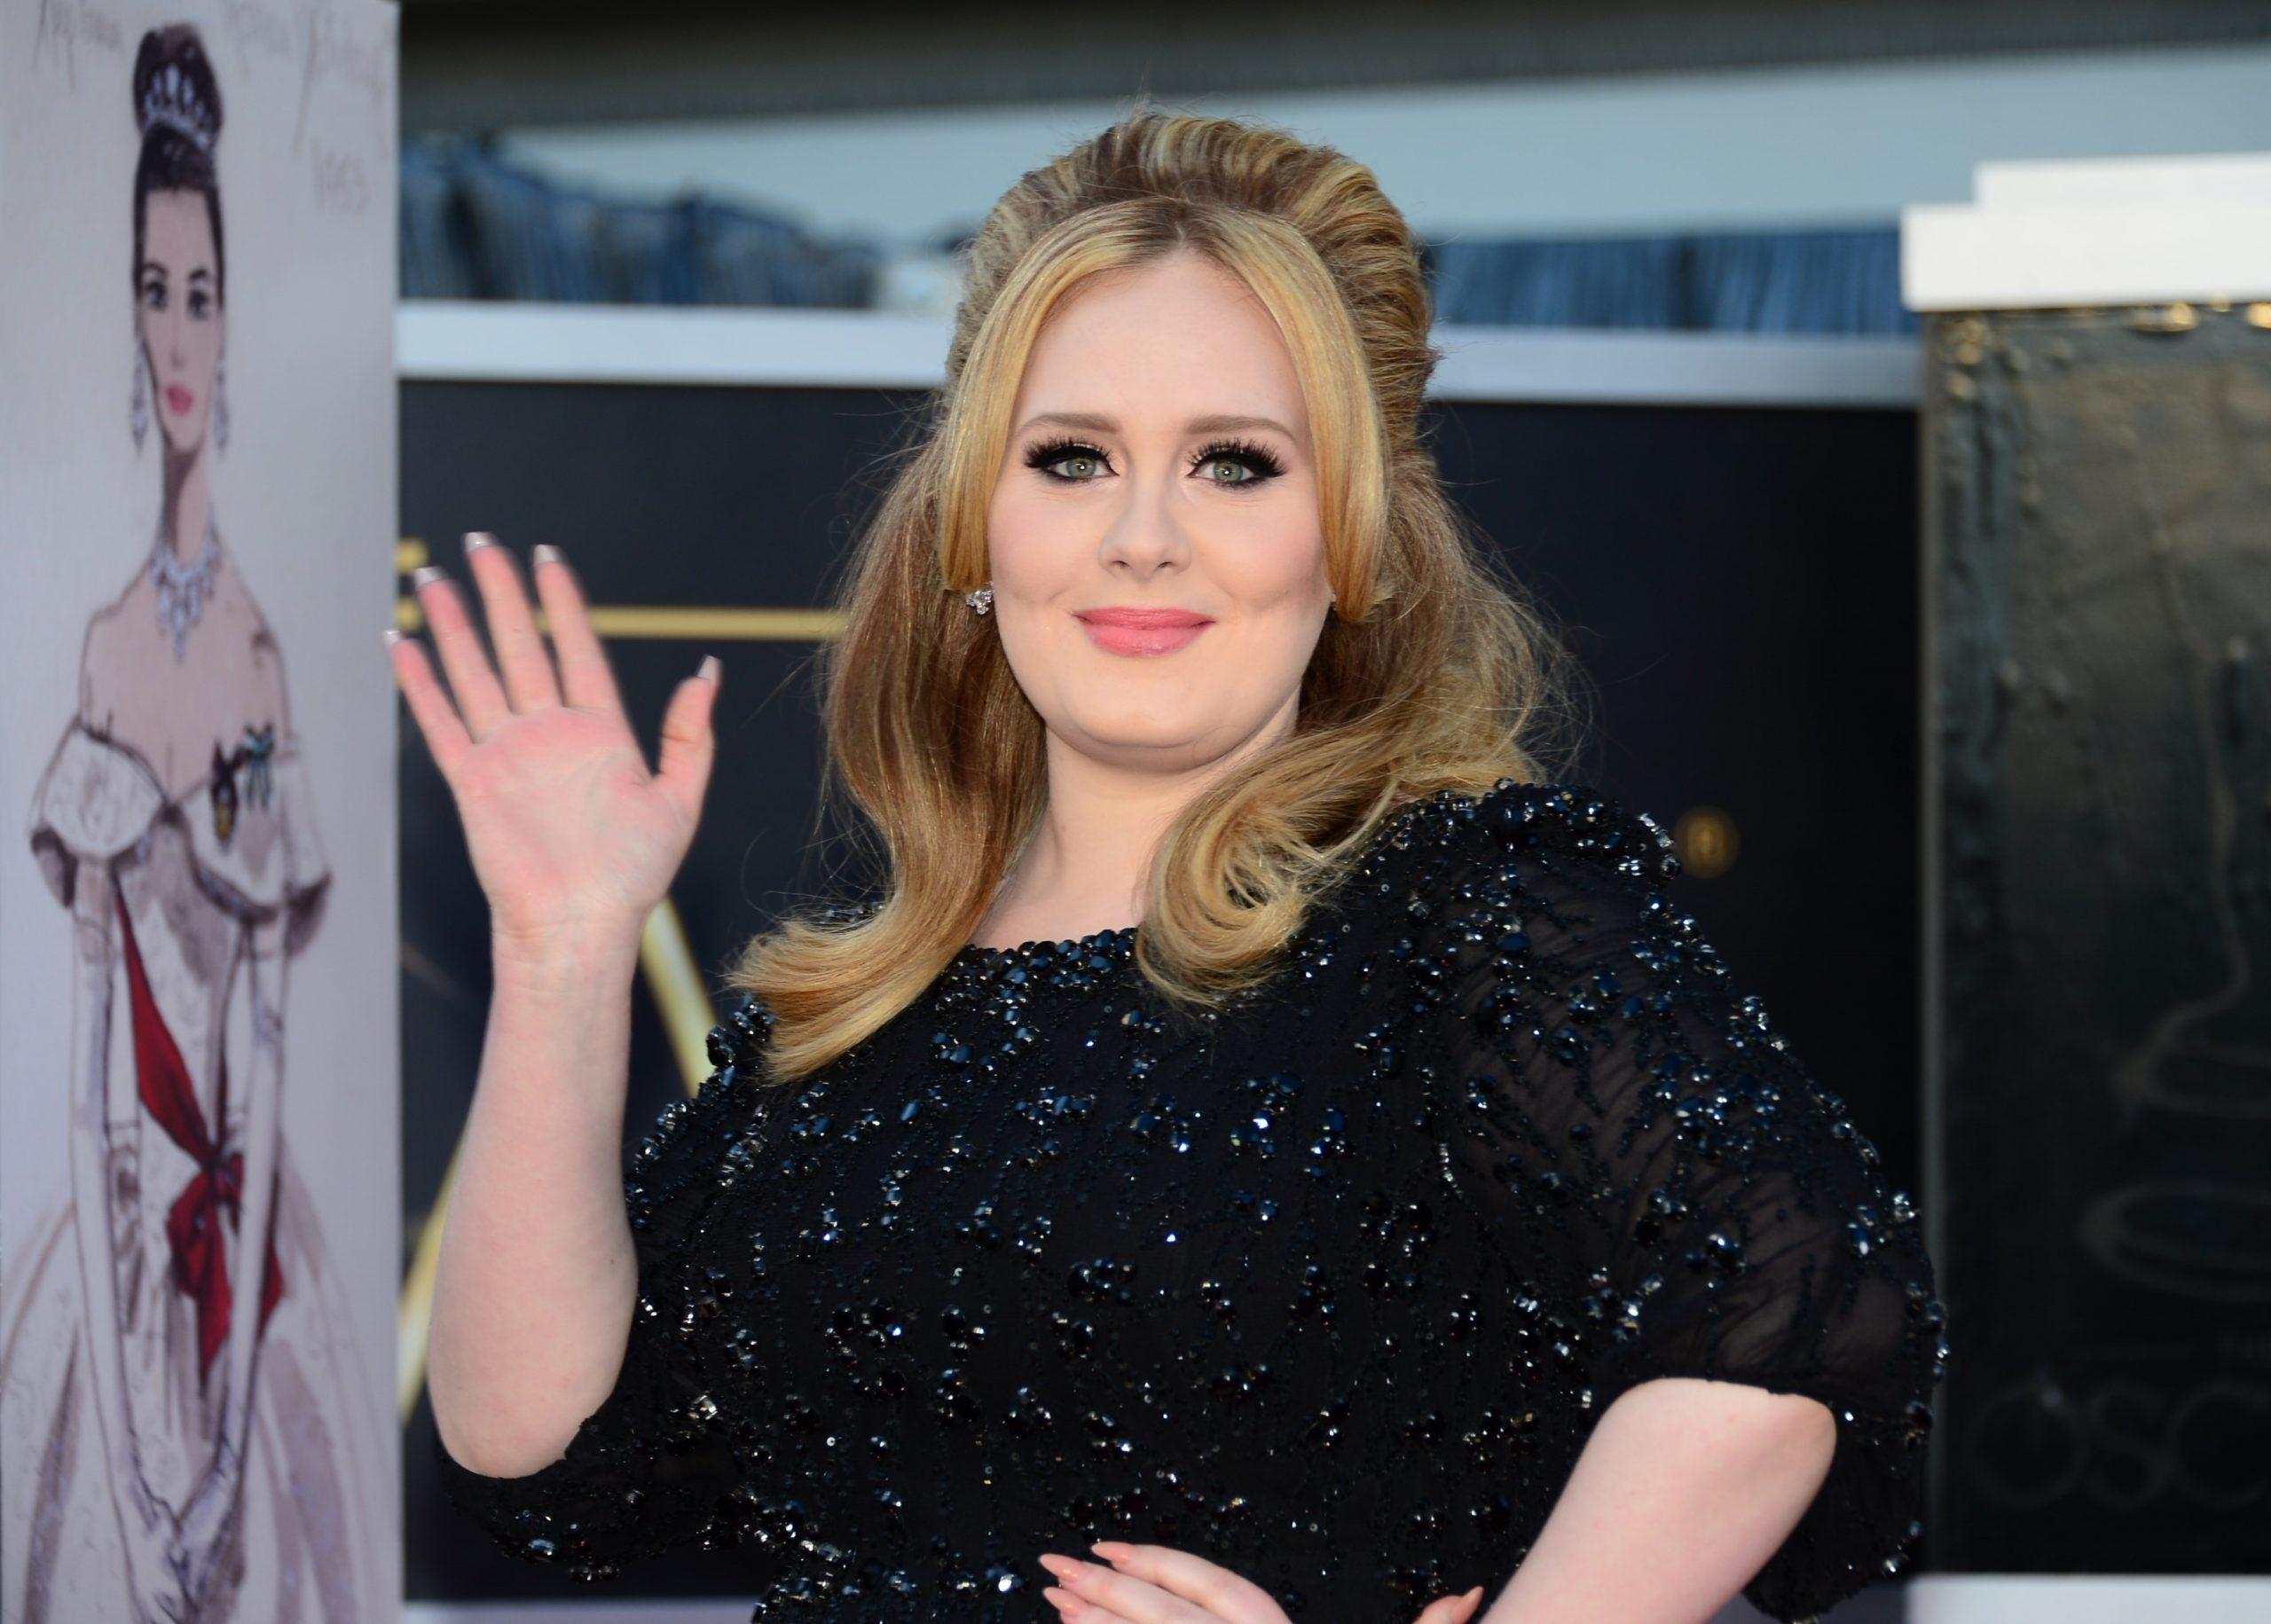 Curves: Adele